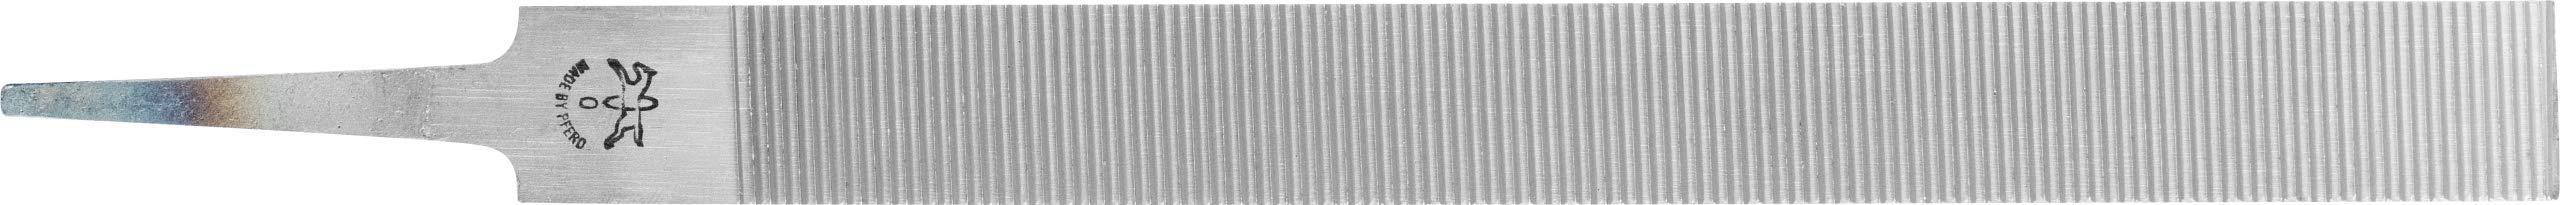 PFERD Flat Hand File for Aluminum, American Pattern, Single Cut, Rectangular, #0 Coarseness, 10'' Length, 31/32'' Width, 1/4'' Thickness